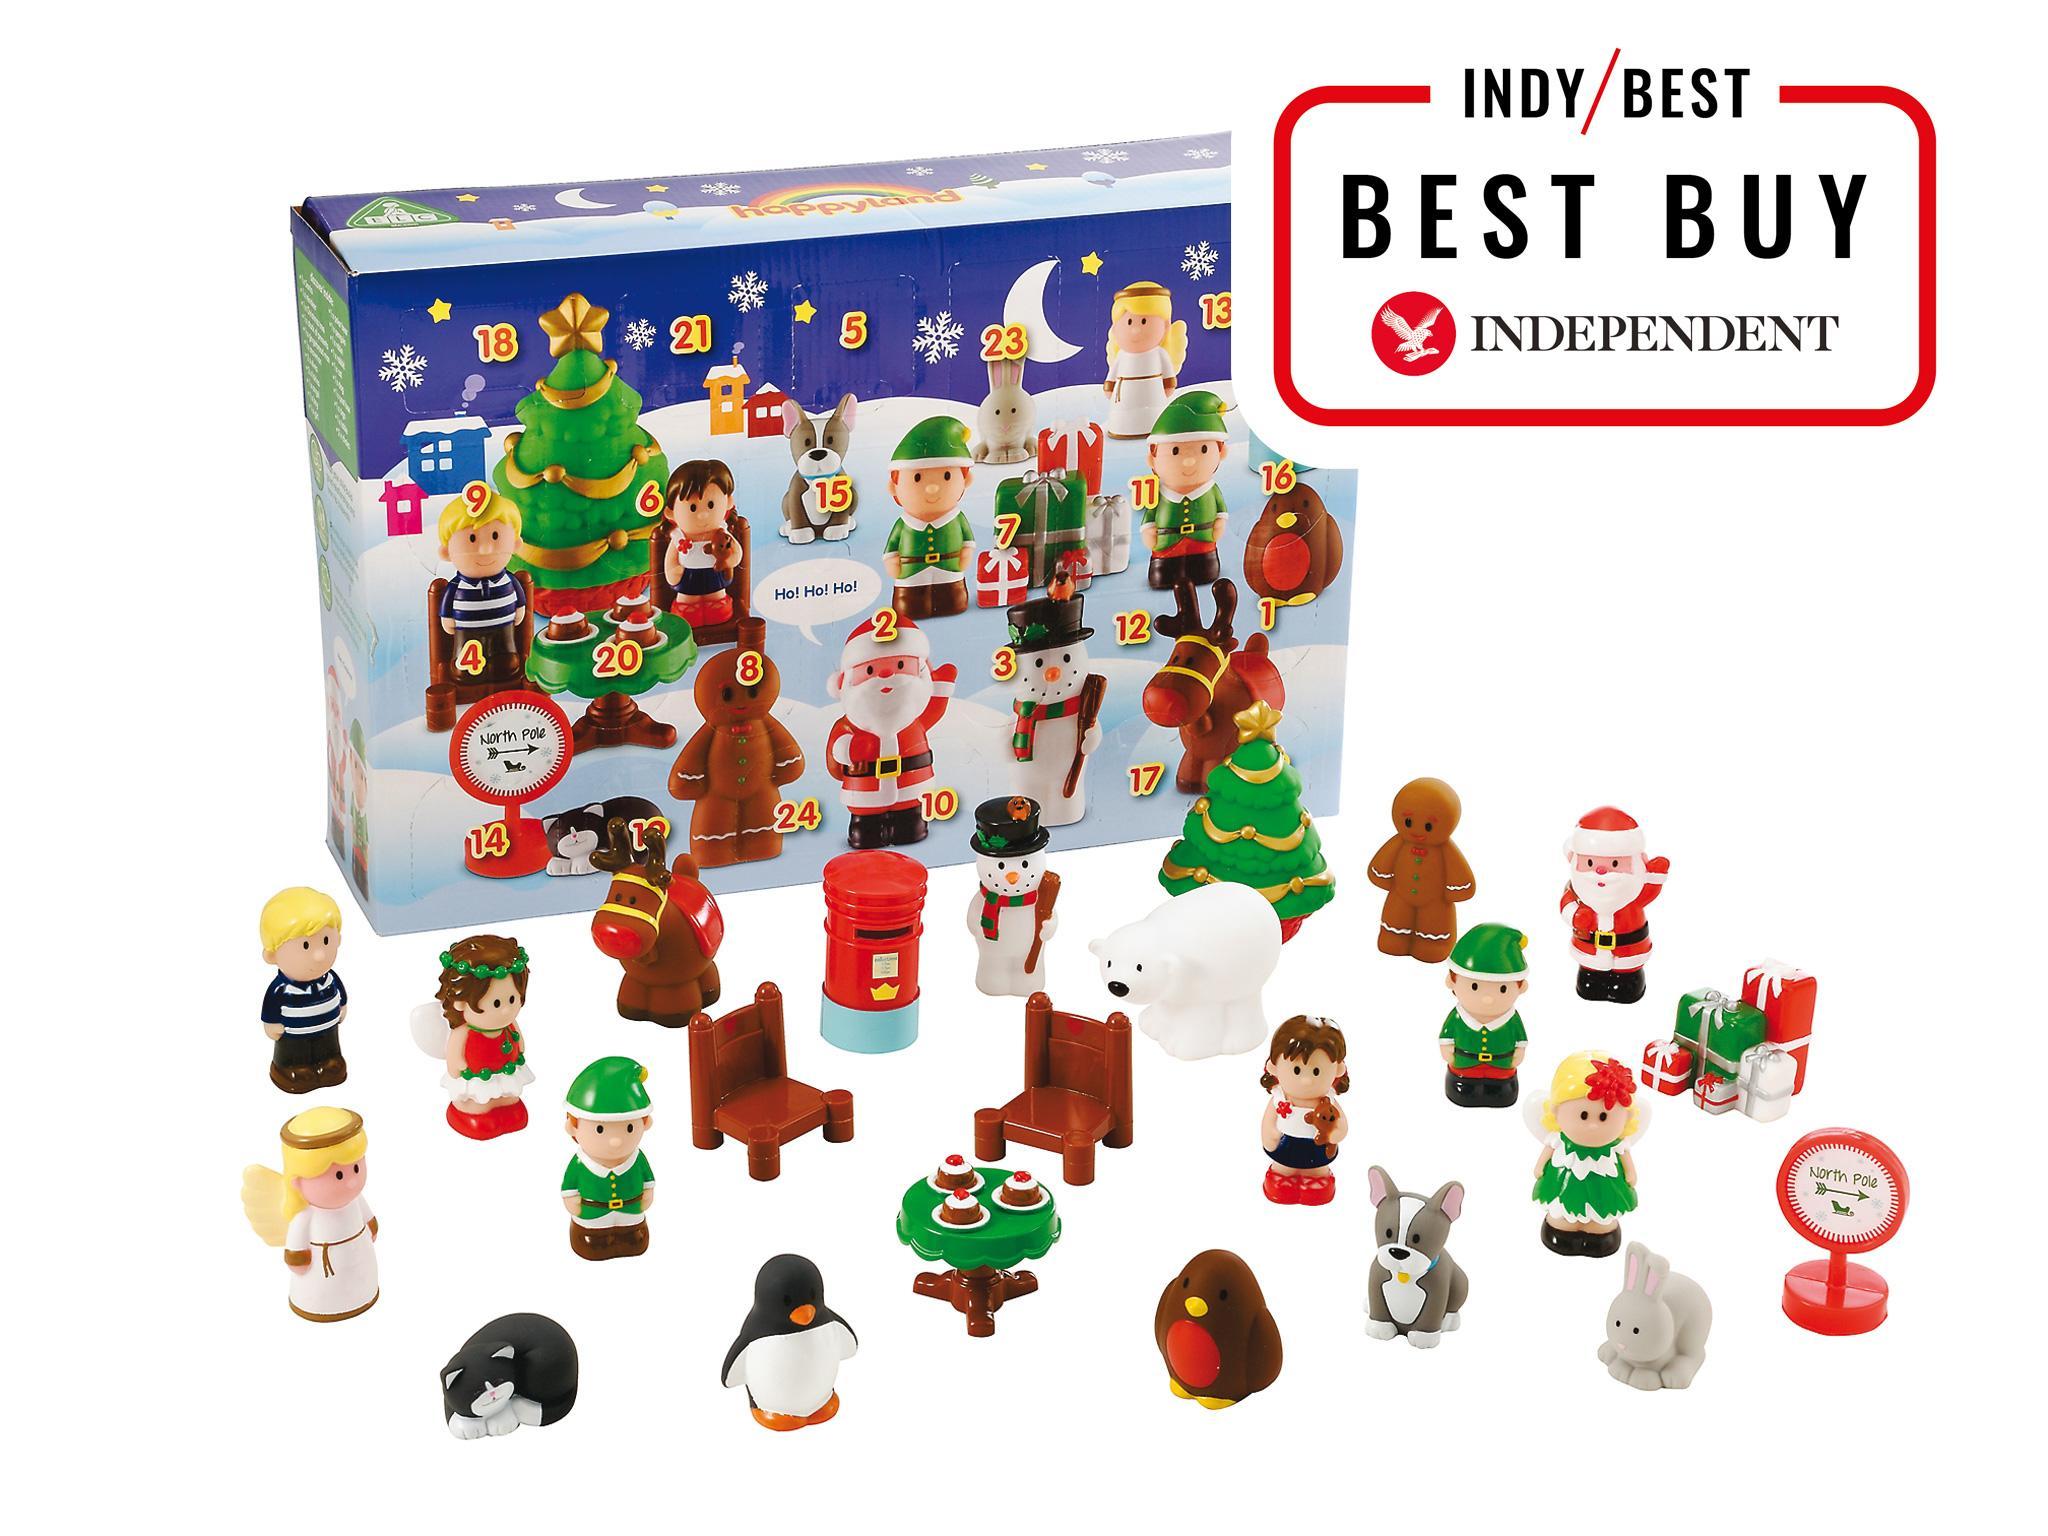 19 best toys - Best Toys Christmas 2014